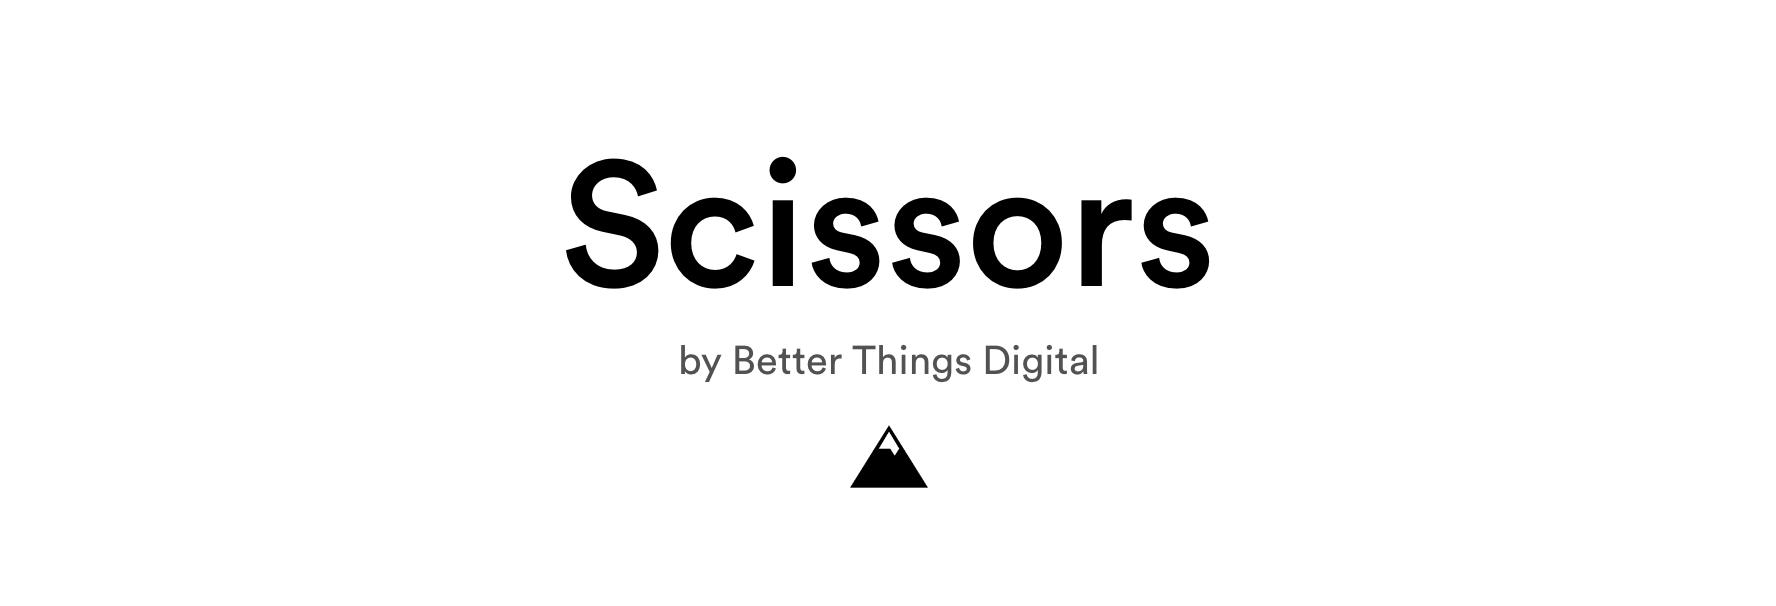 Scissors by Better Things Digital